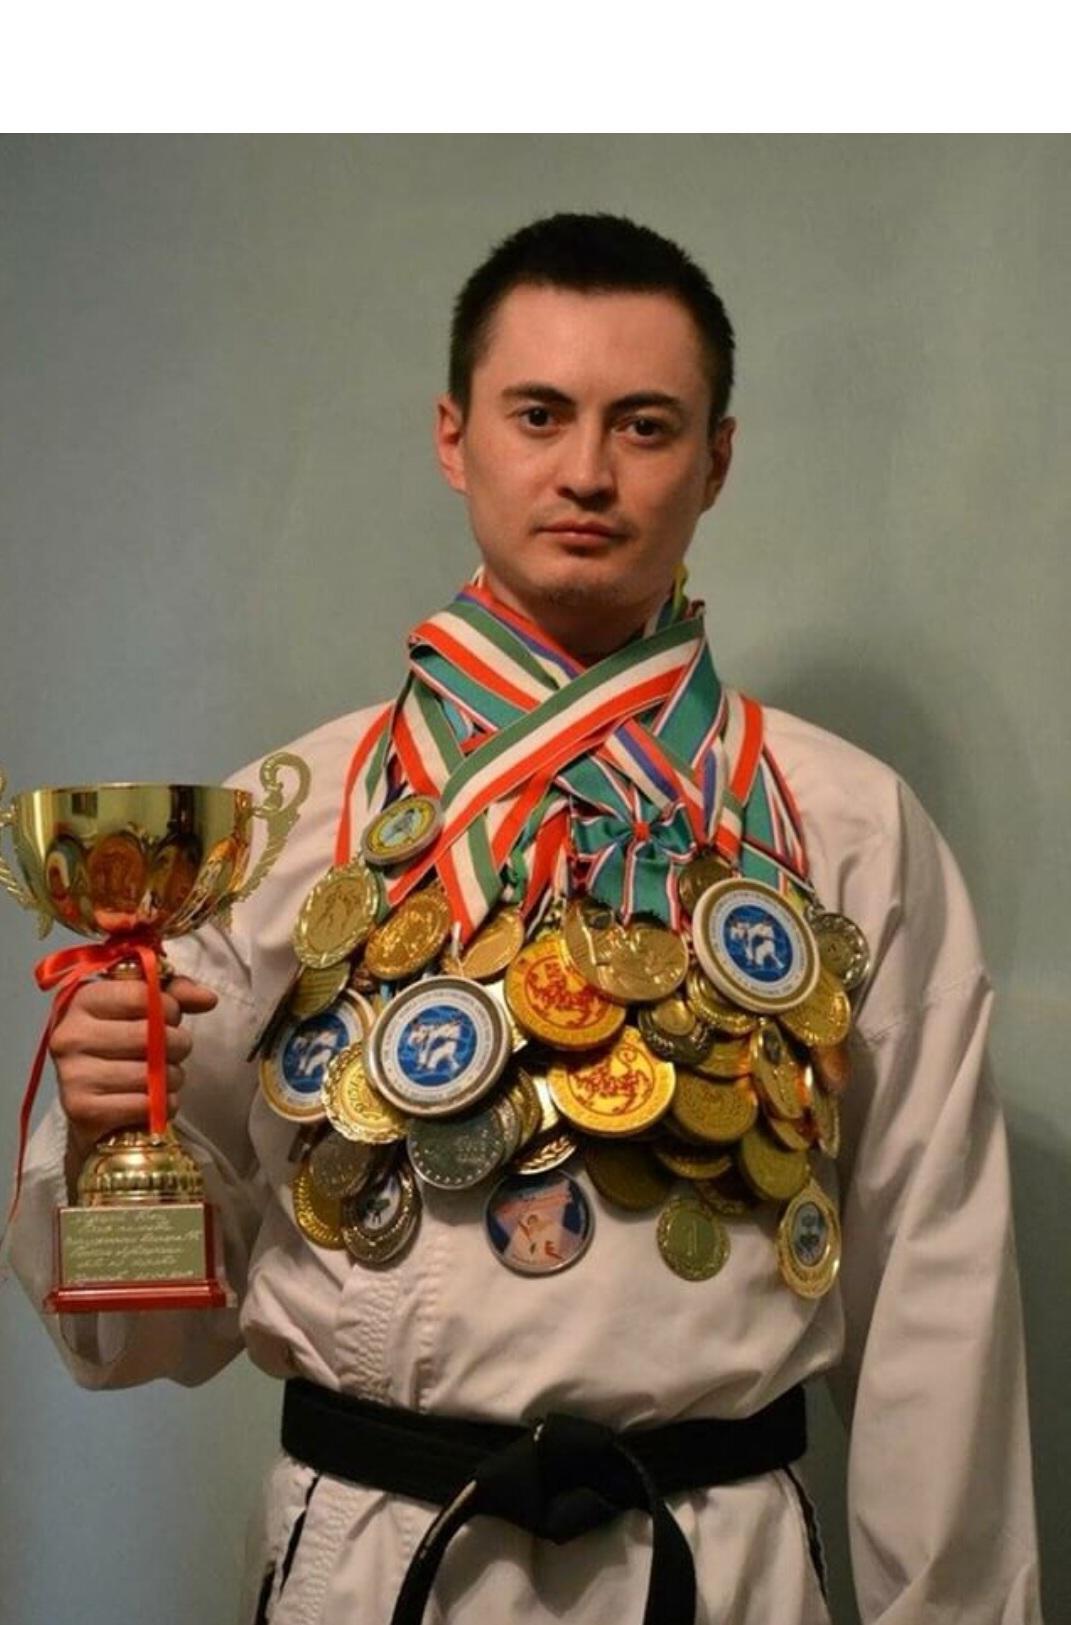 Тренер  Каратэ Кутуев Р.М.